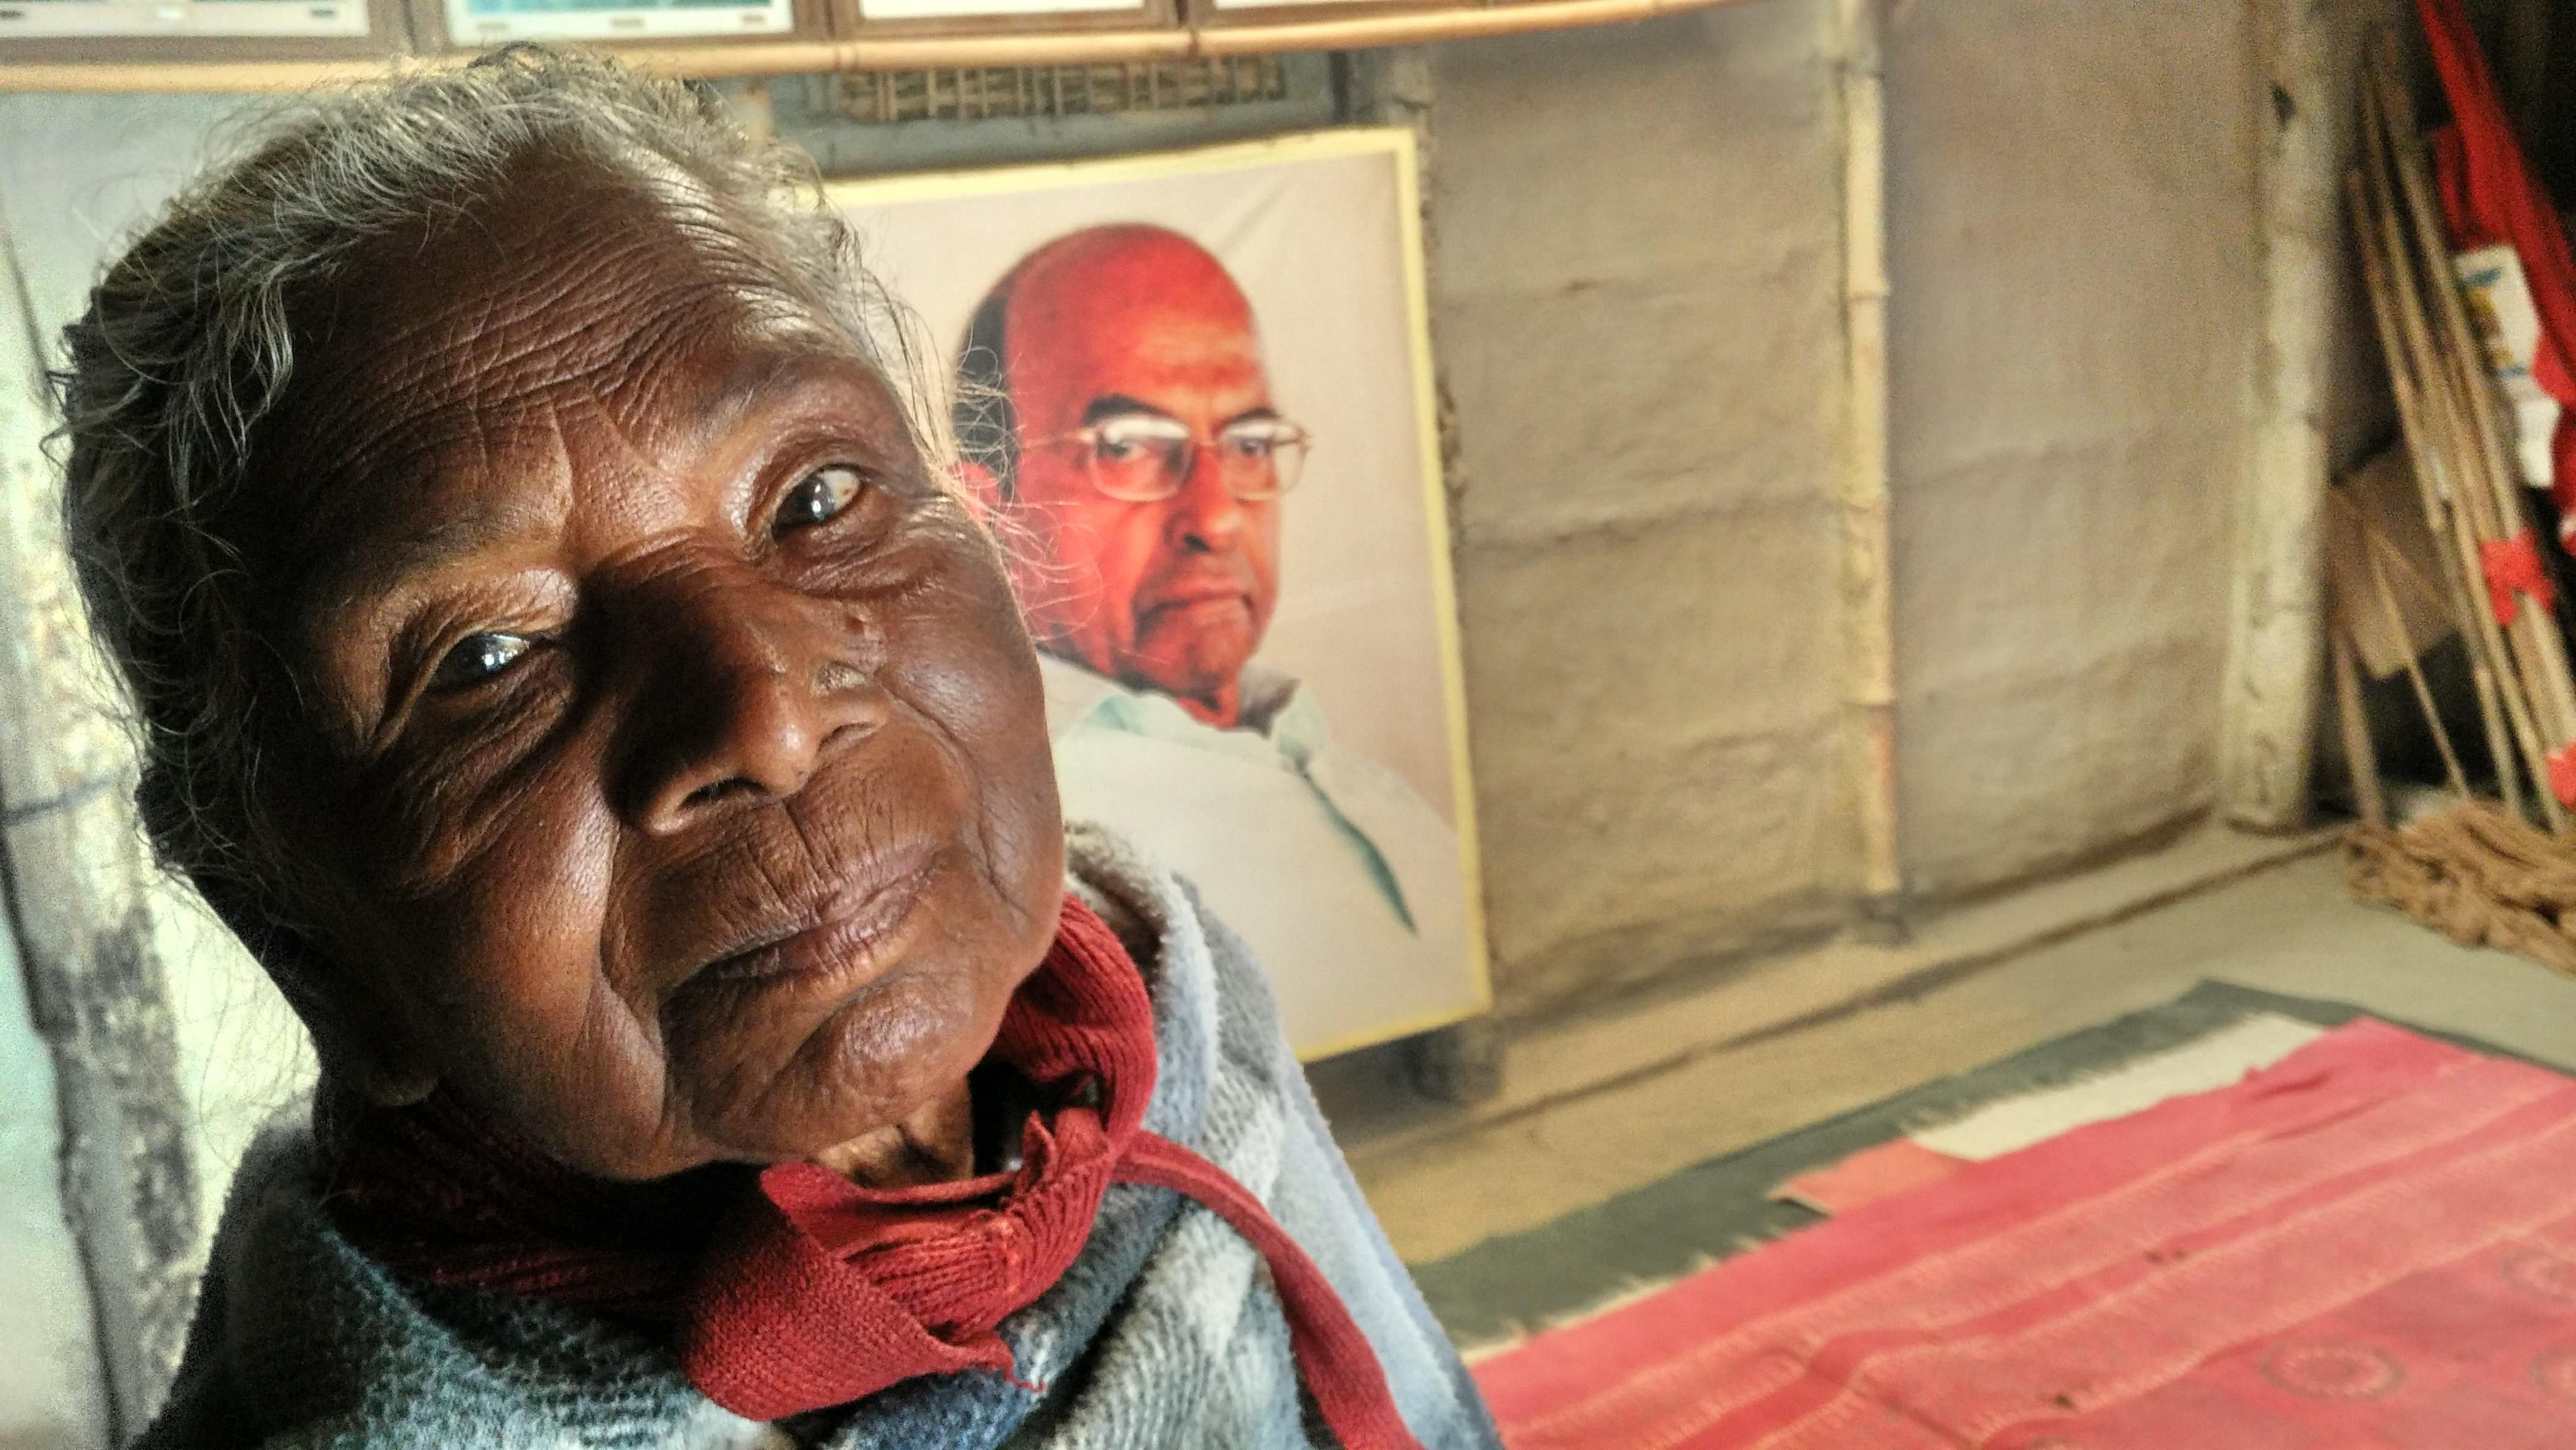 Fifty Years On, Naxalbari Veteran Shanti Munda is Still At War With Injustice